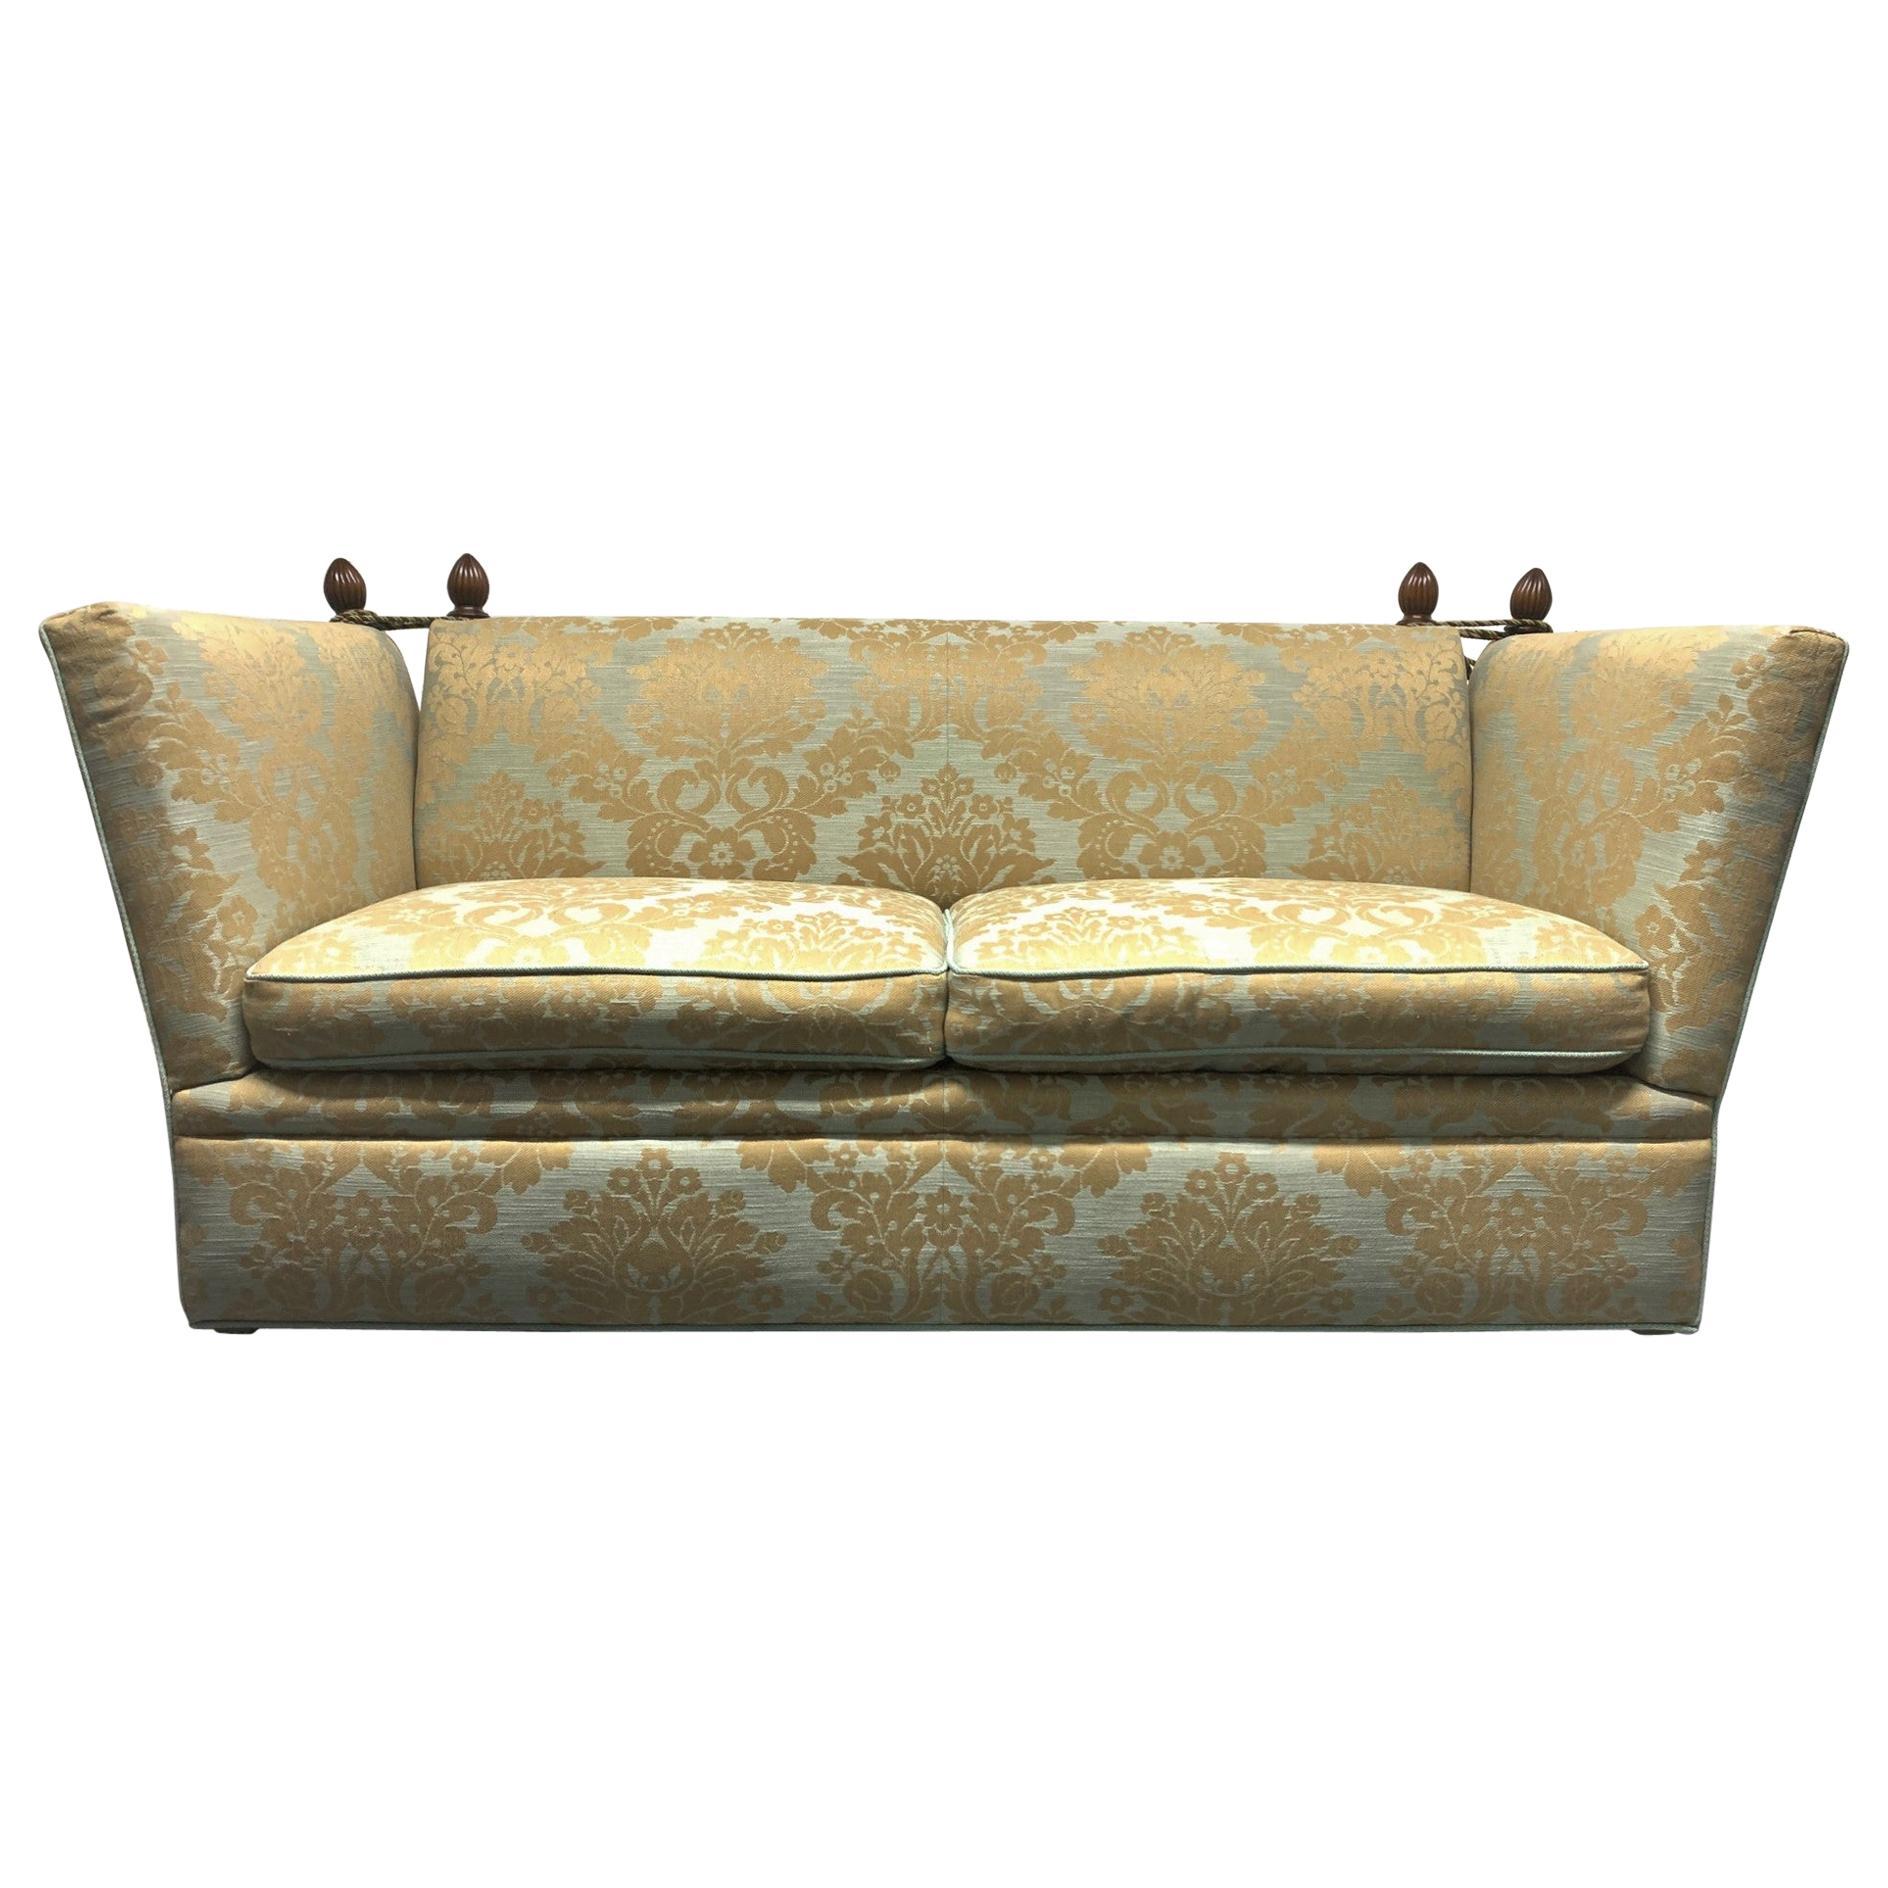 English Knole Sofa with Custom Upholstery